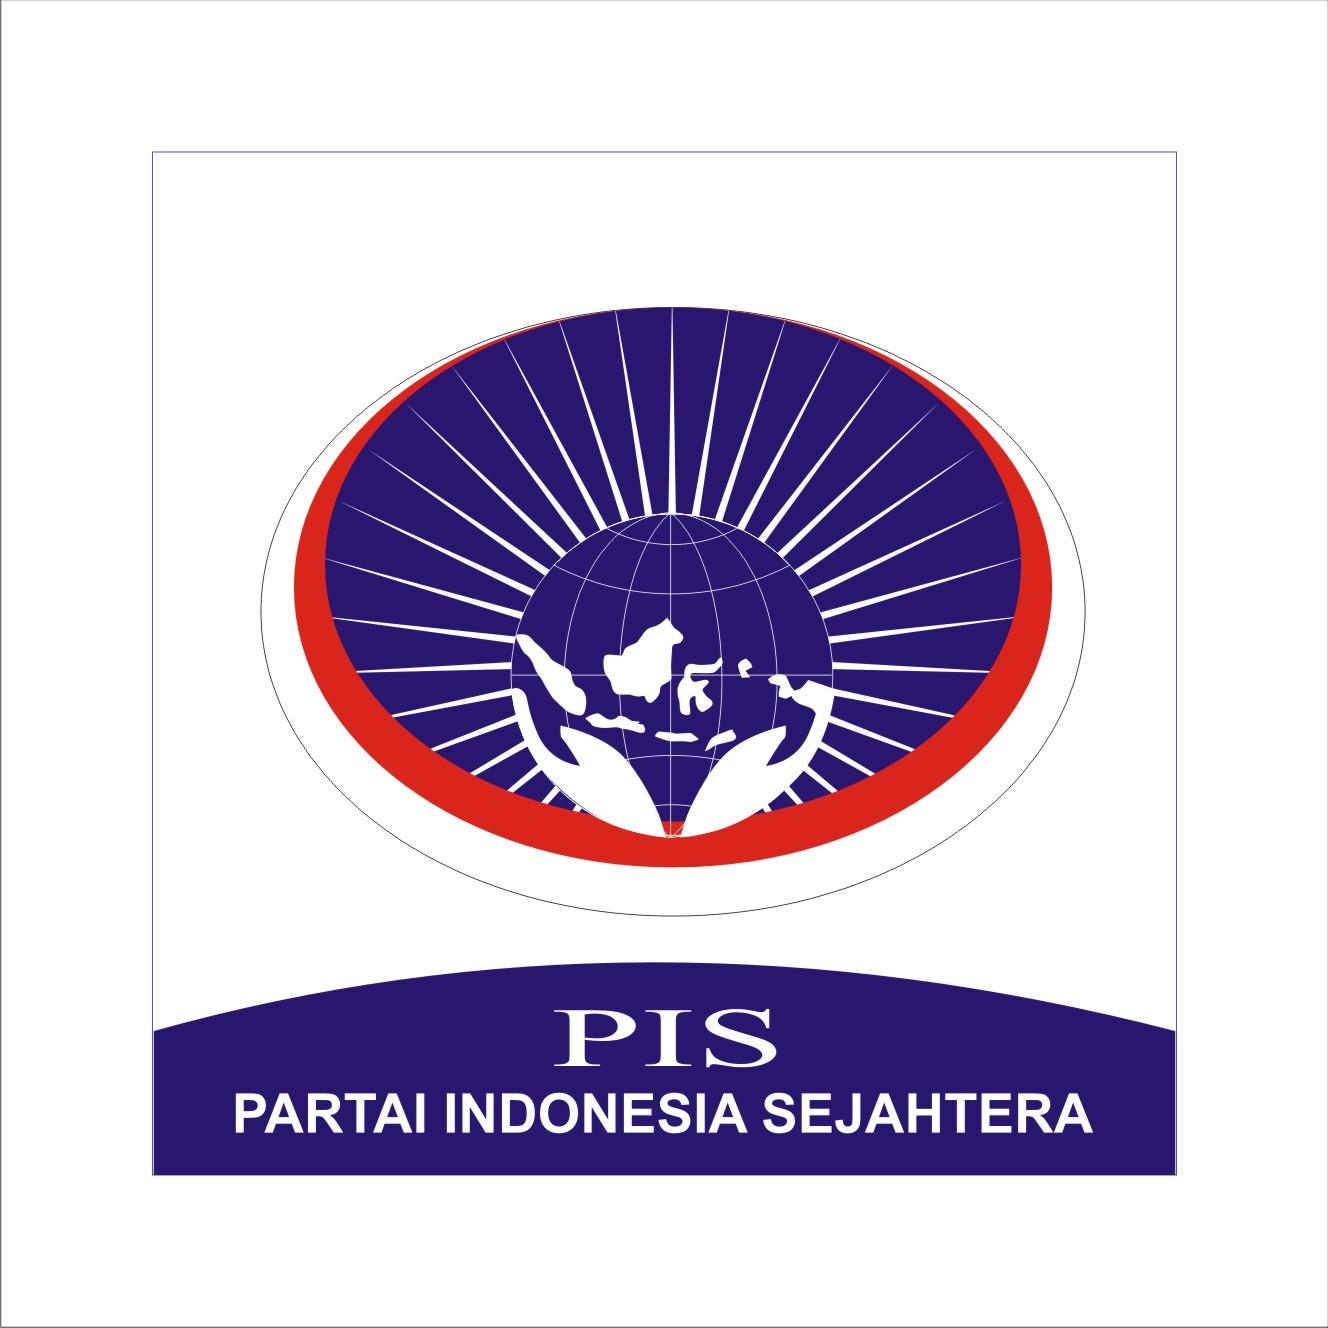 *: Lambang Partai Politik Indonesia th 2009